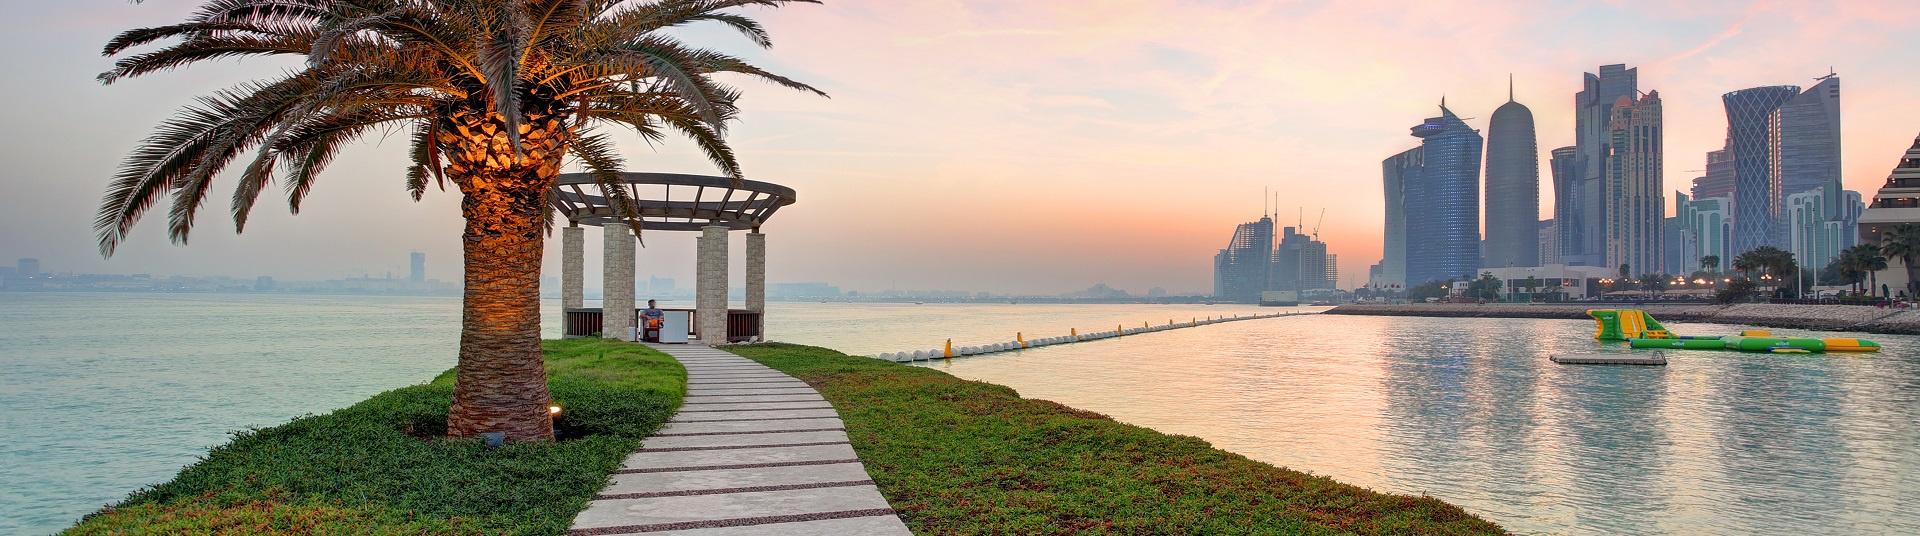 Week-end pas cher Doha